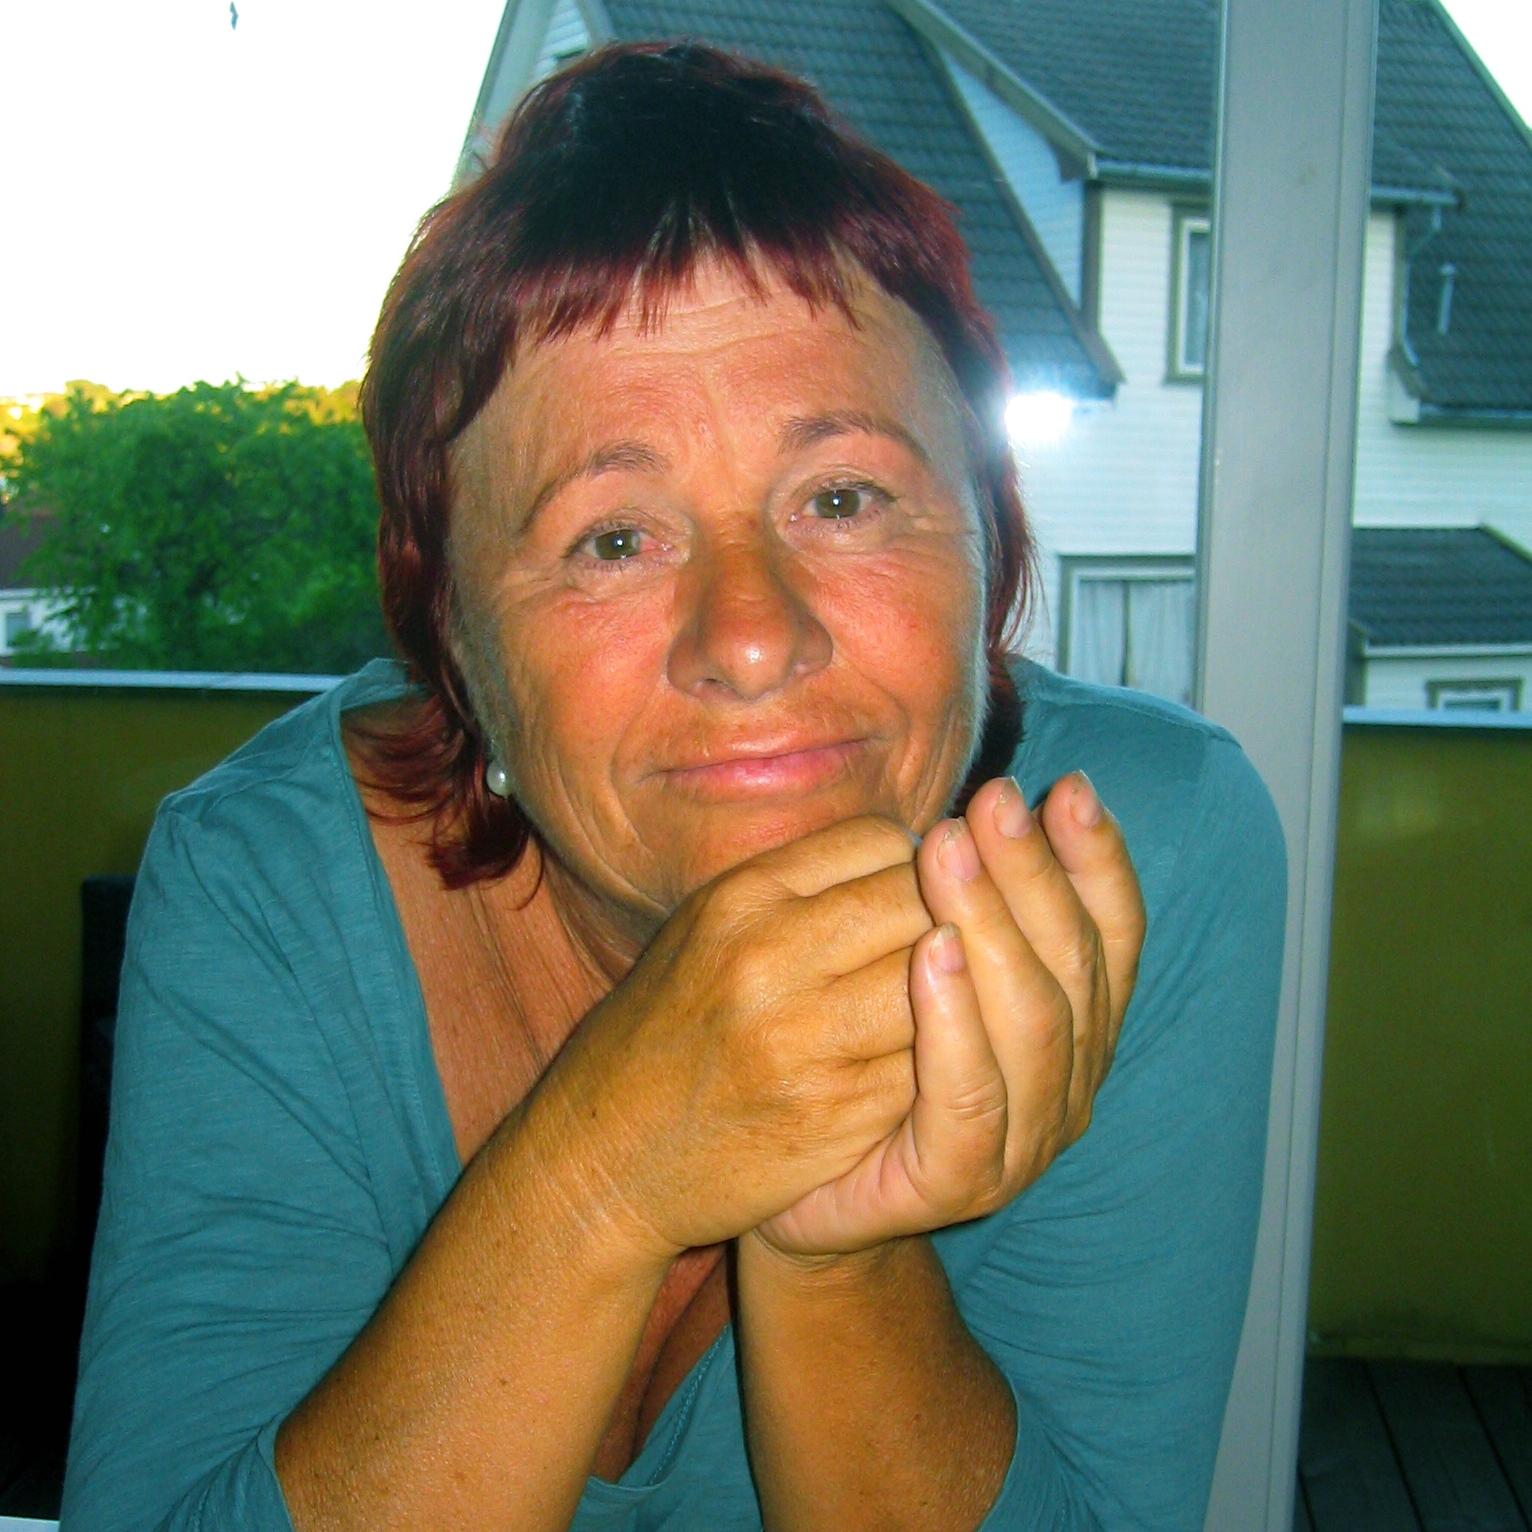 Kari Wigstøl